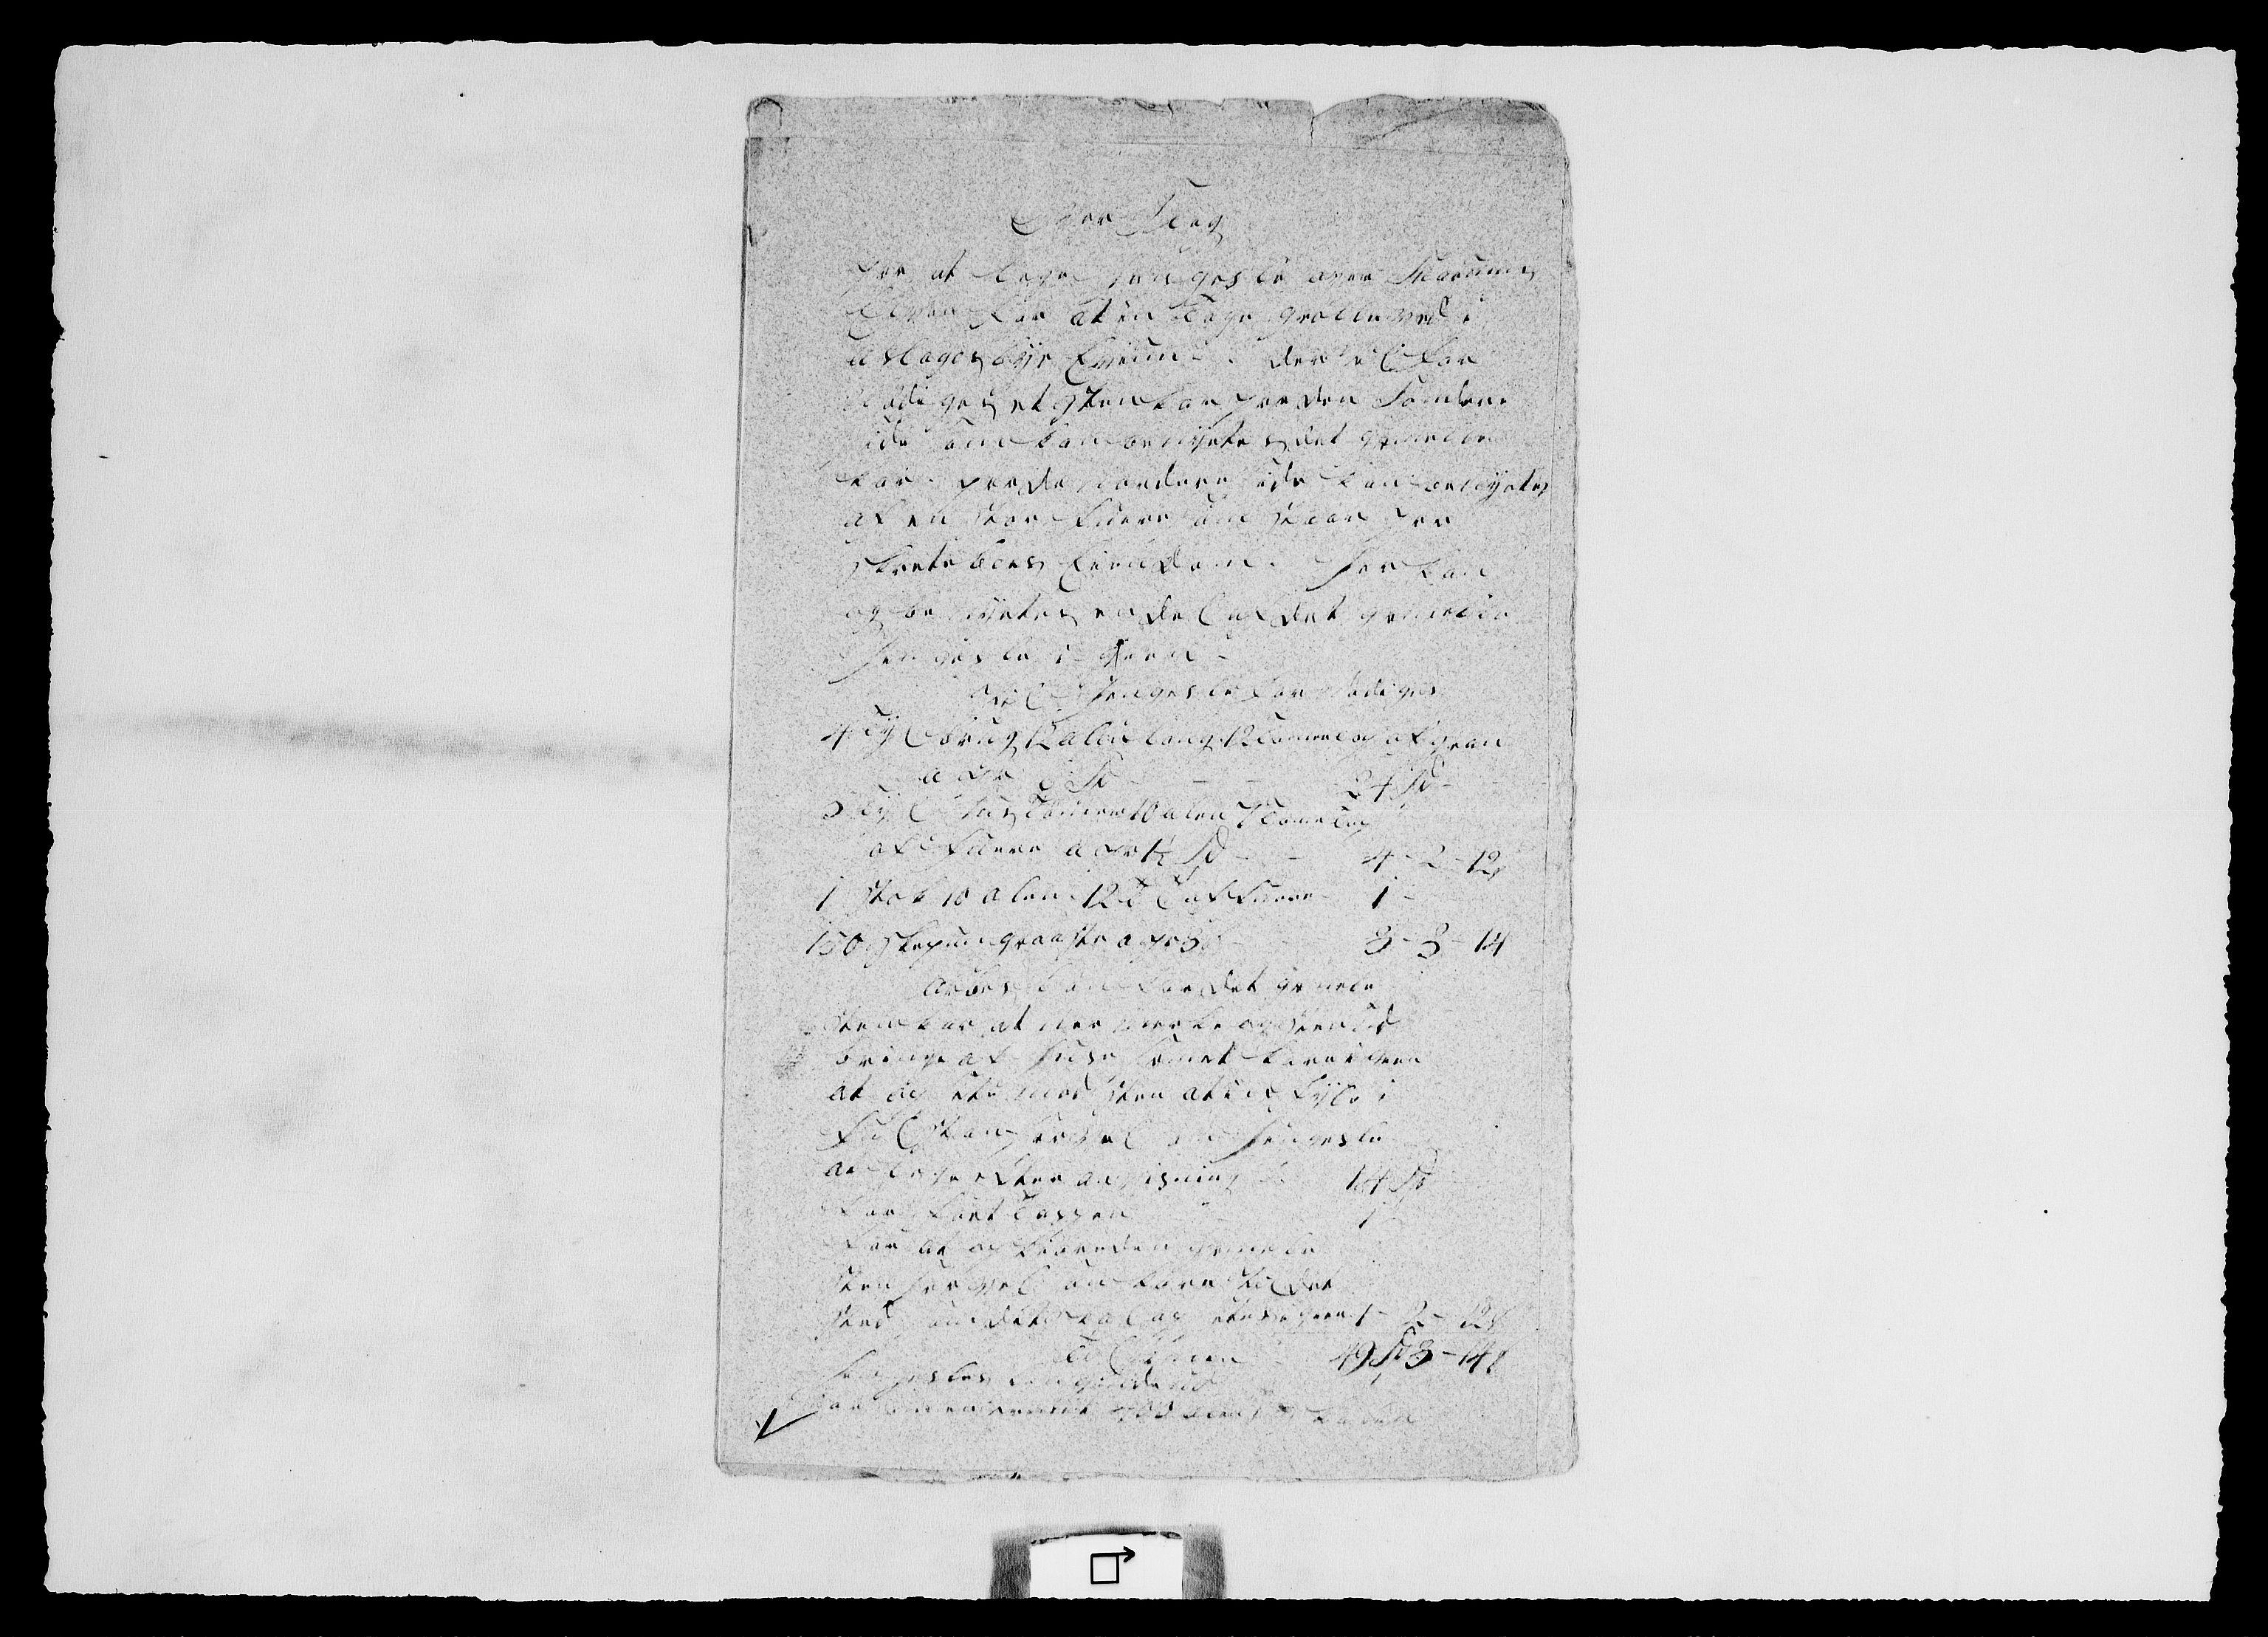 RA, Modums Blaafarveværk, G/Gf/L0368, 1824-1840, s. 2